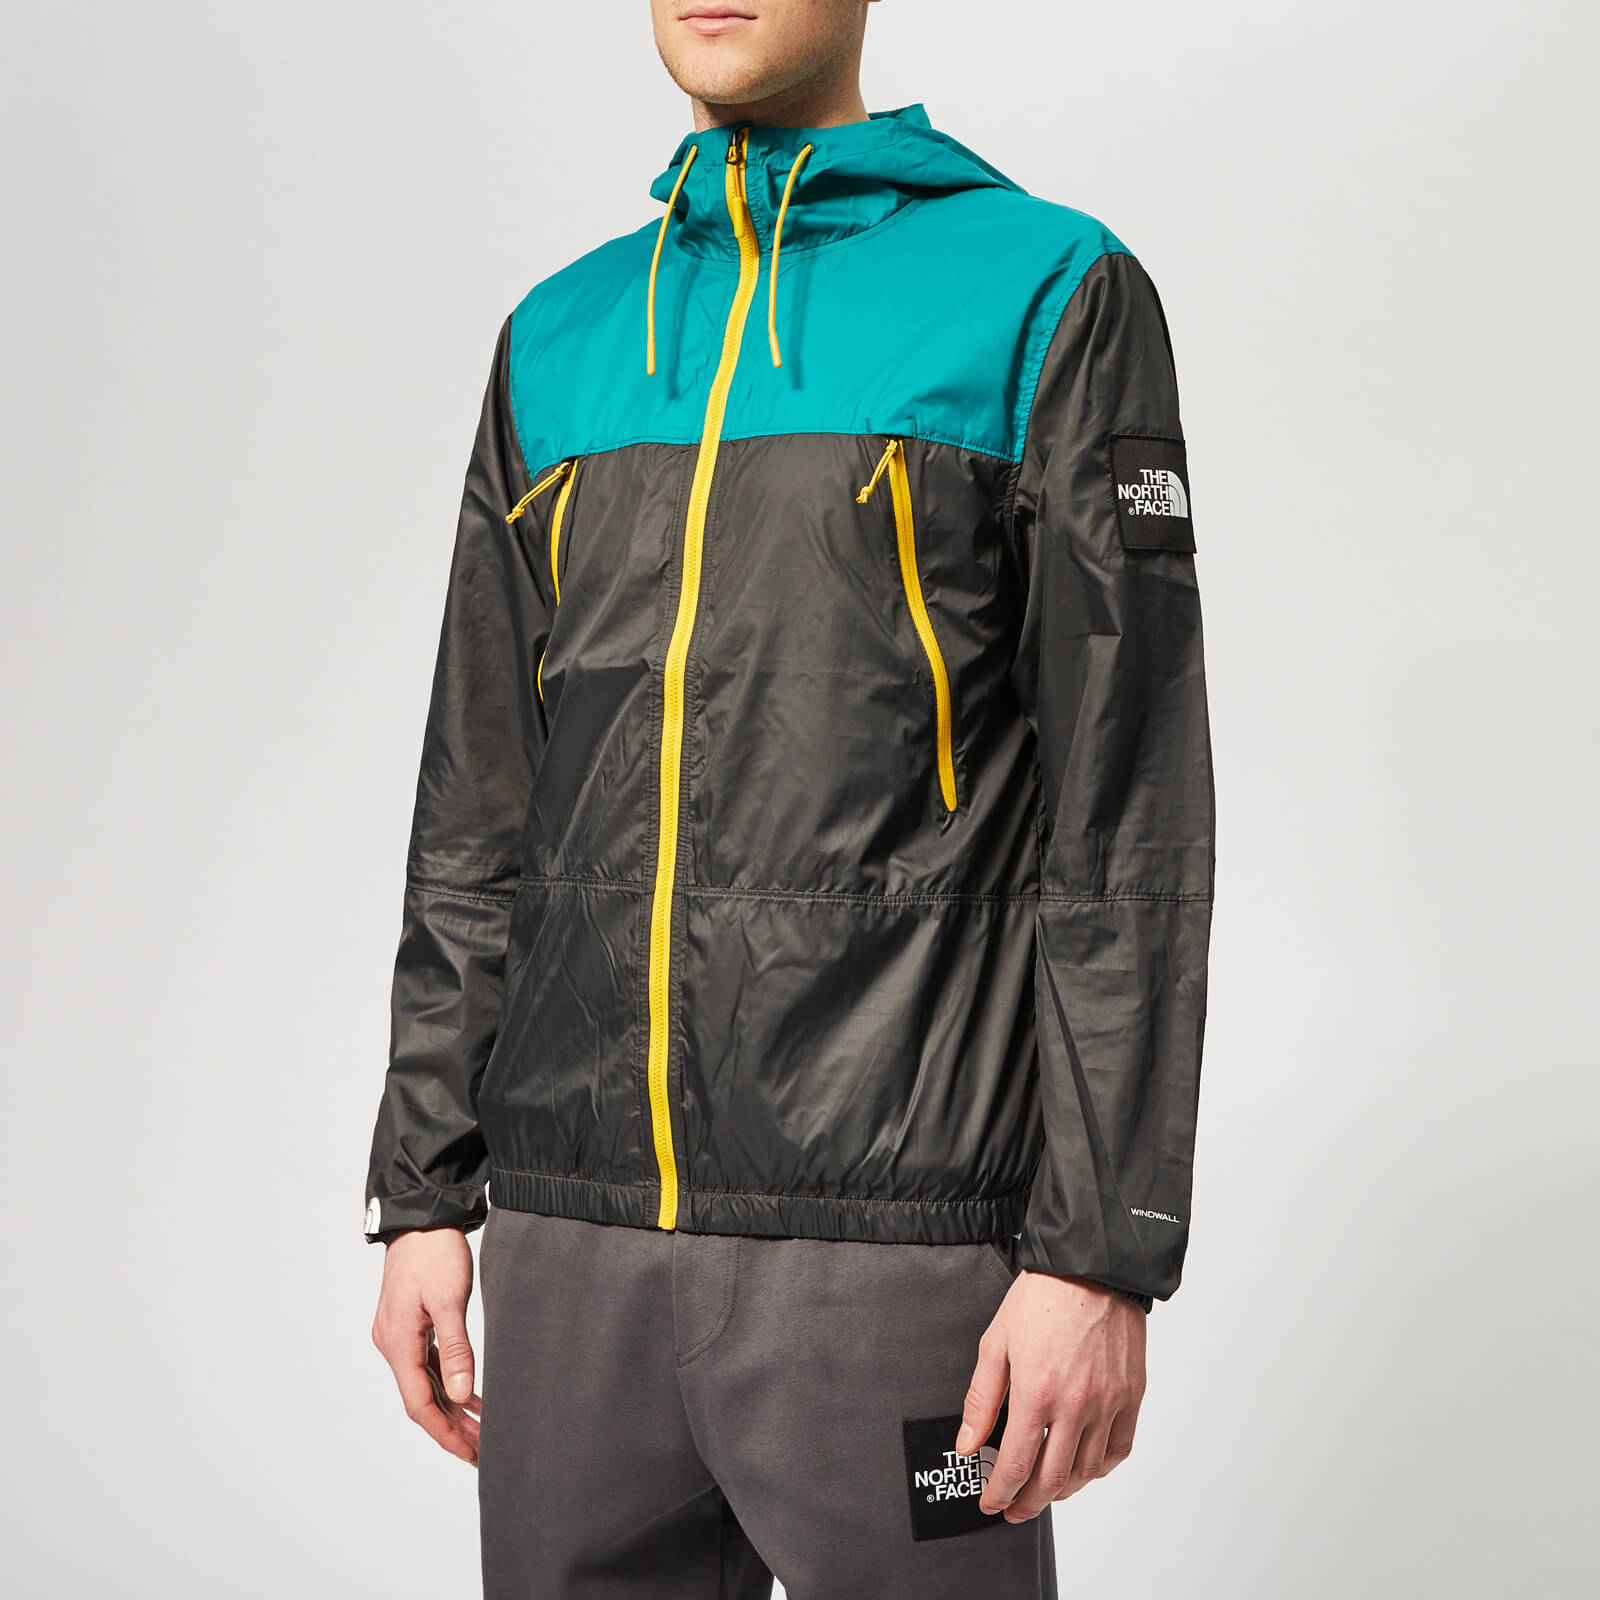 e377ad5b2 The North Face Men's 1990 Seasonal Mountain Jacket - Asphalt Grey/Everglade